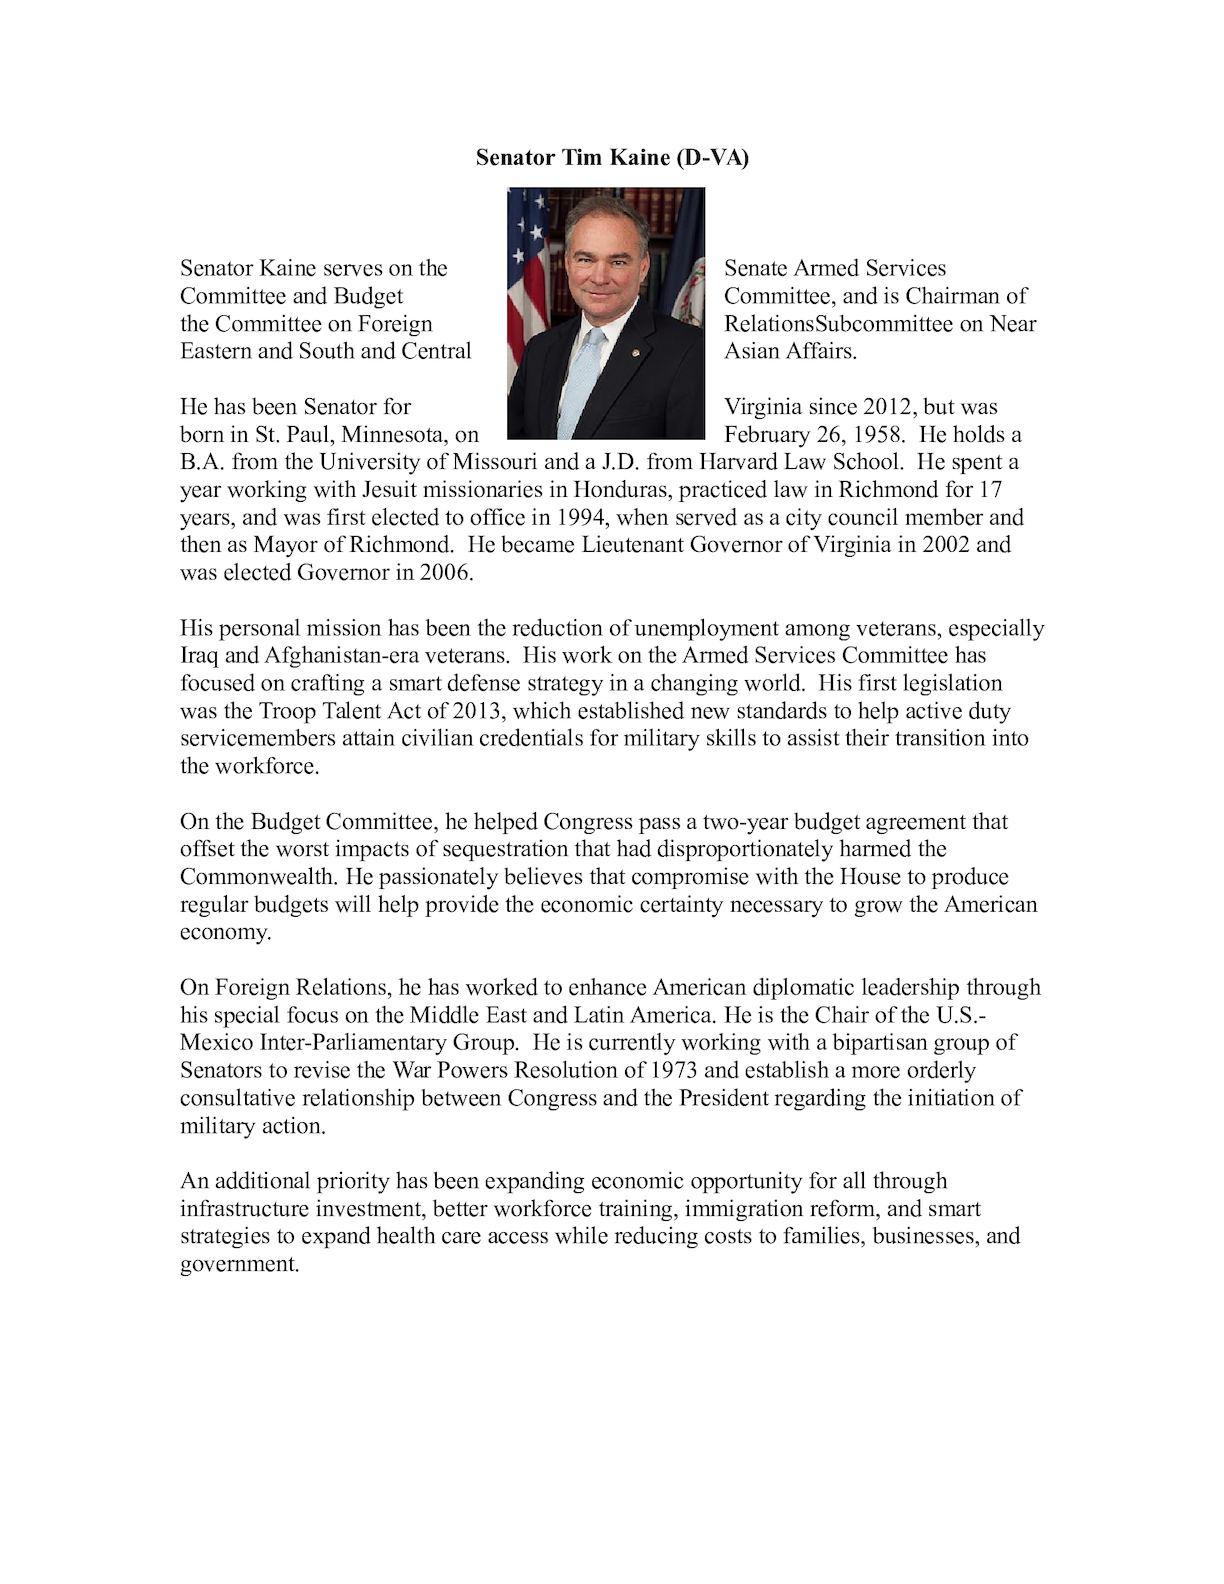 CV Senator Tim- Kaine